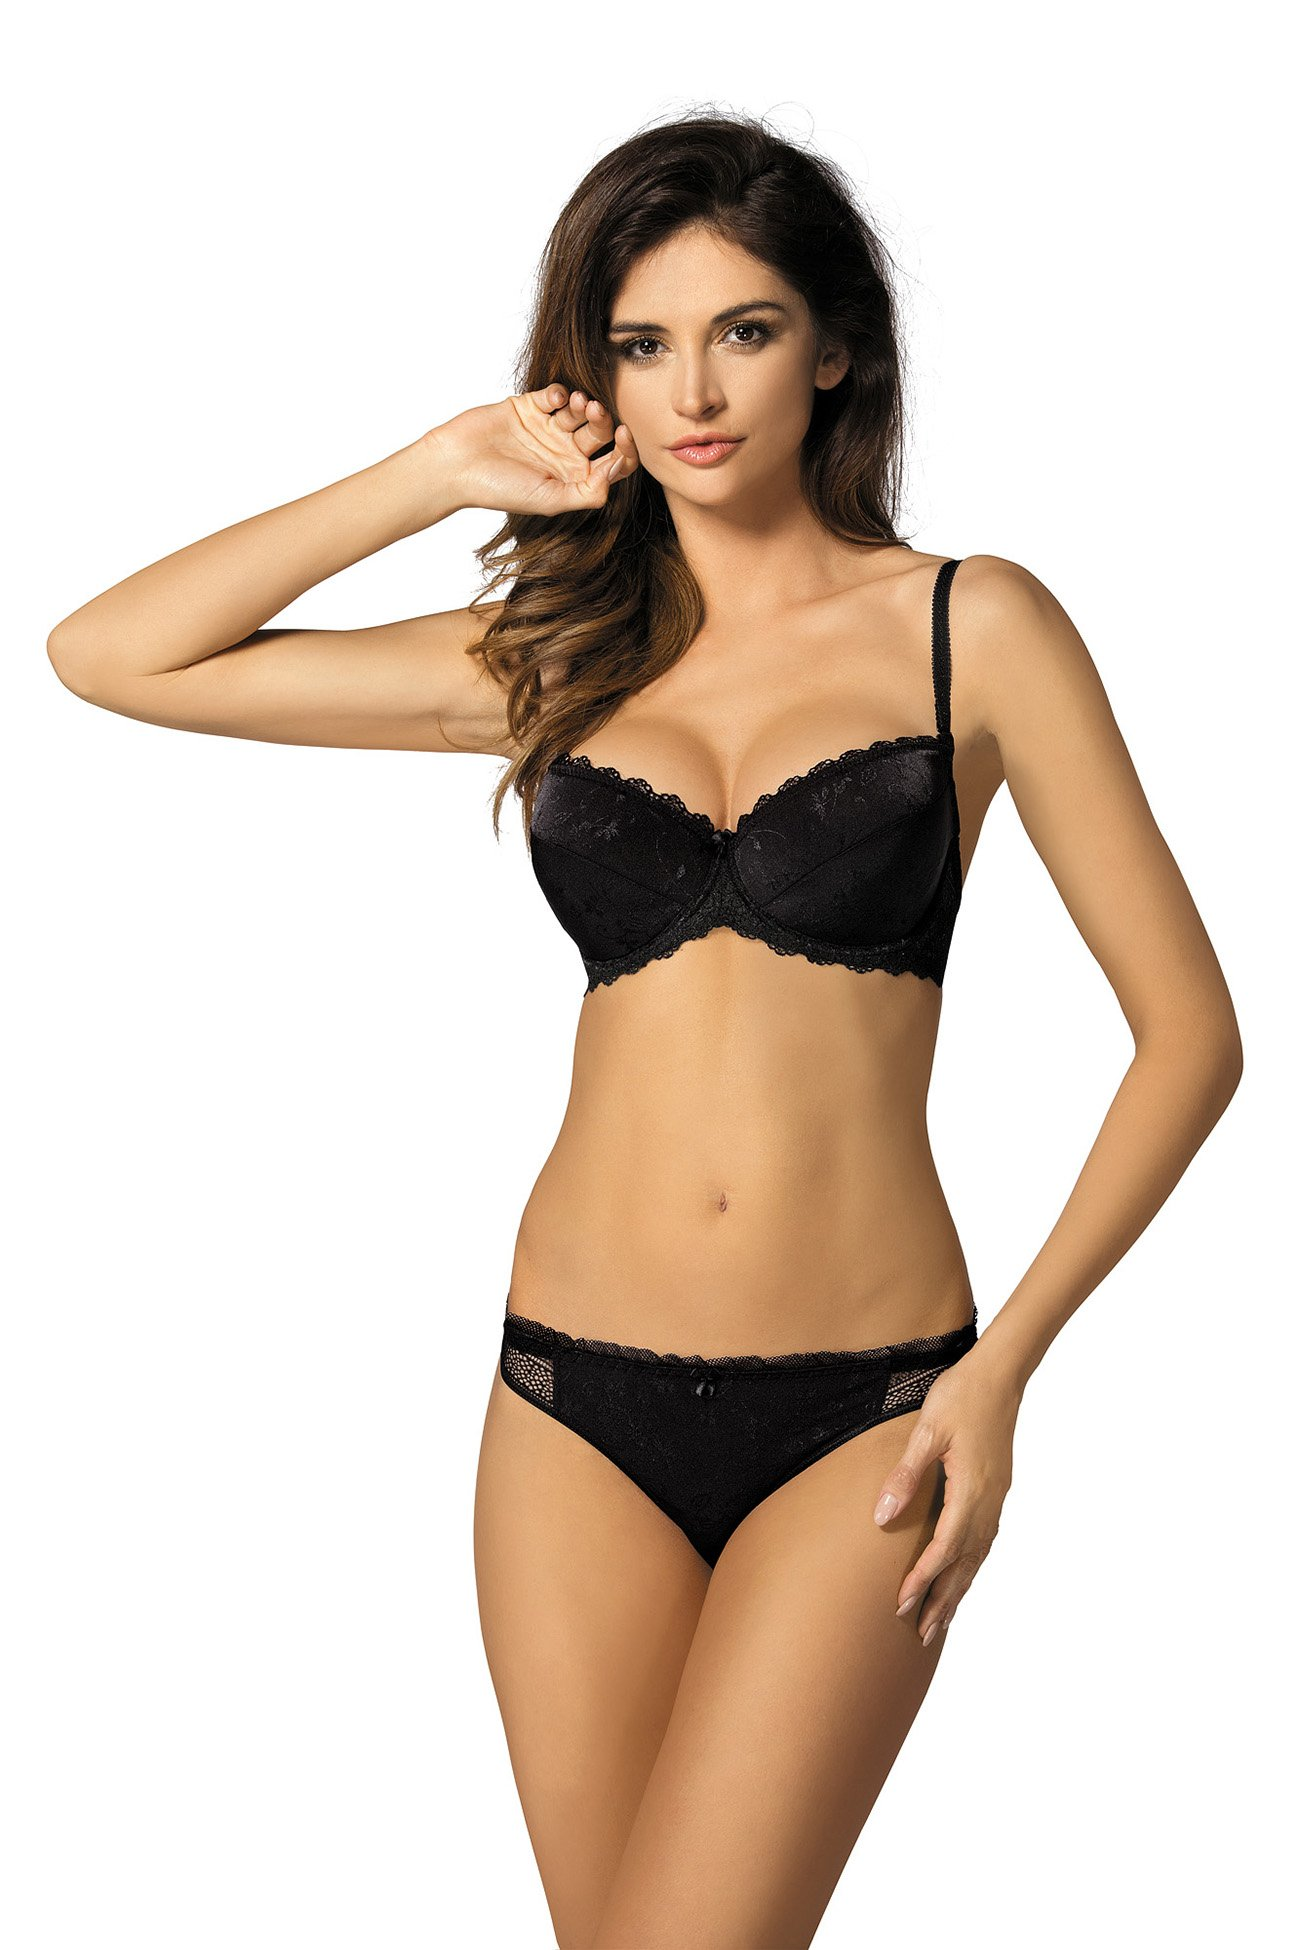 48181071cb Gorteks Linda B1 push-up bra black Classic collection